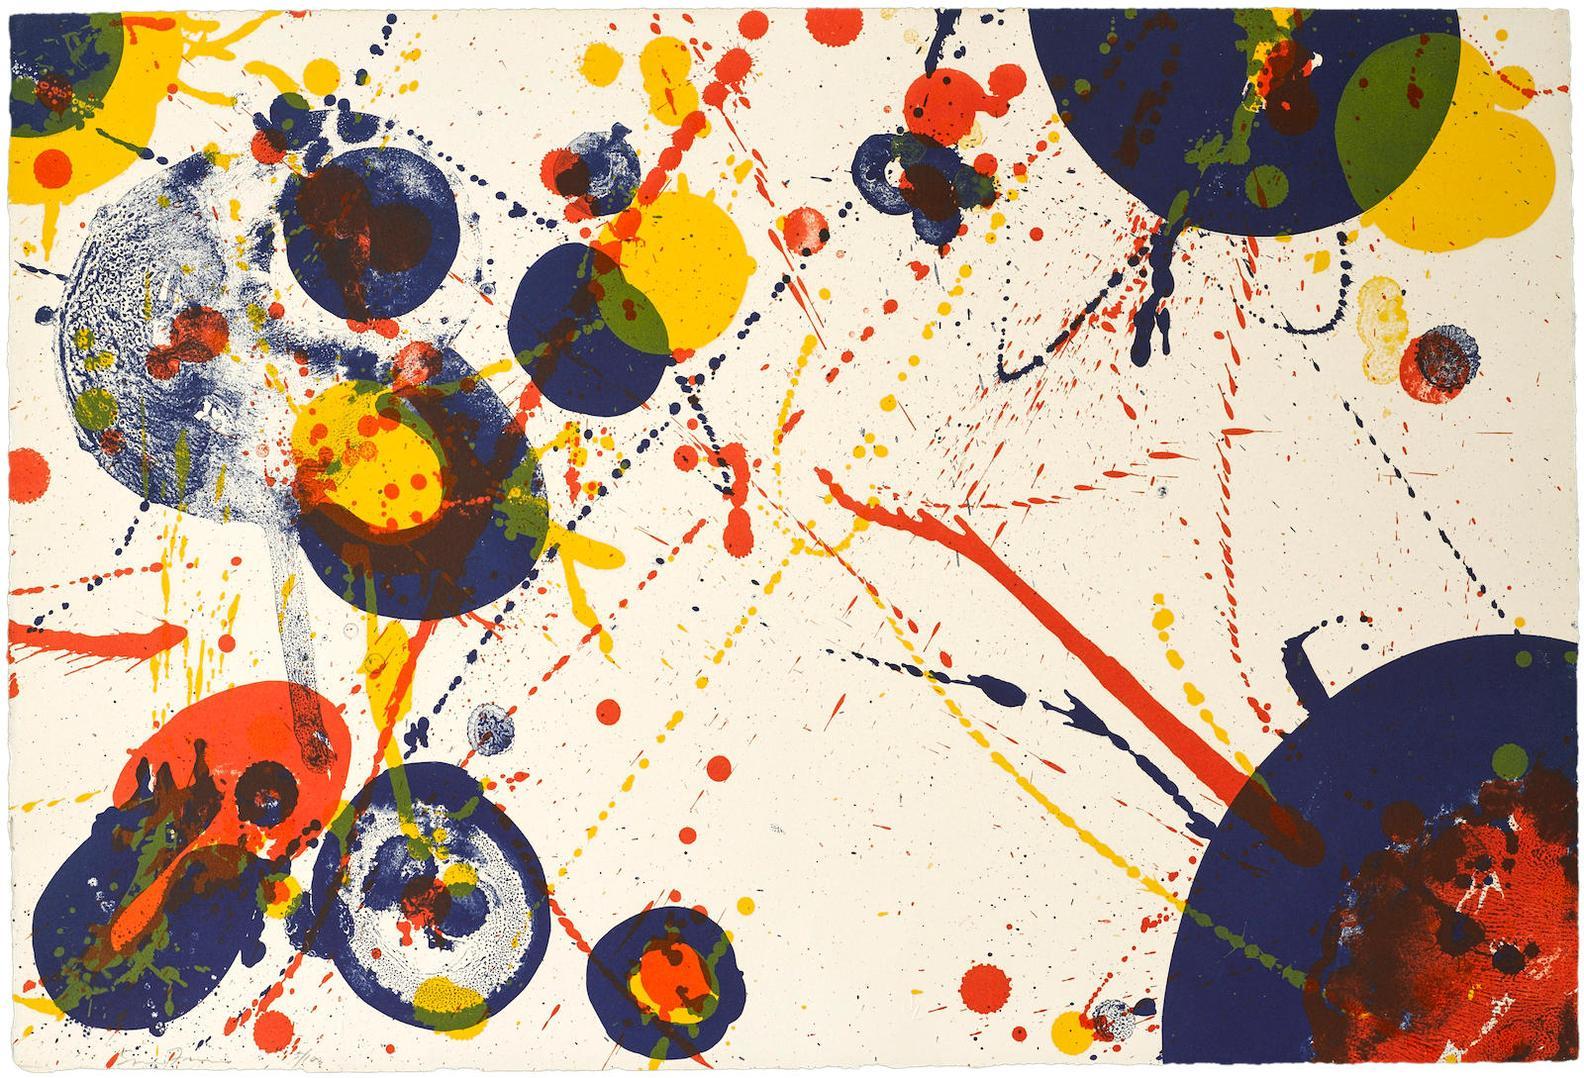 Sam Francis-Pl. 7, From Pasadena Box Suite-1963